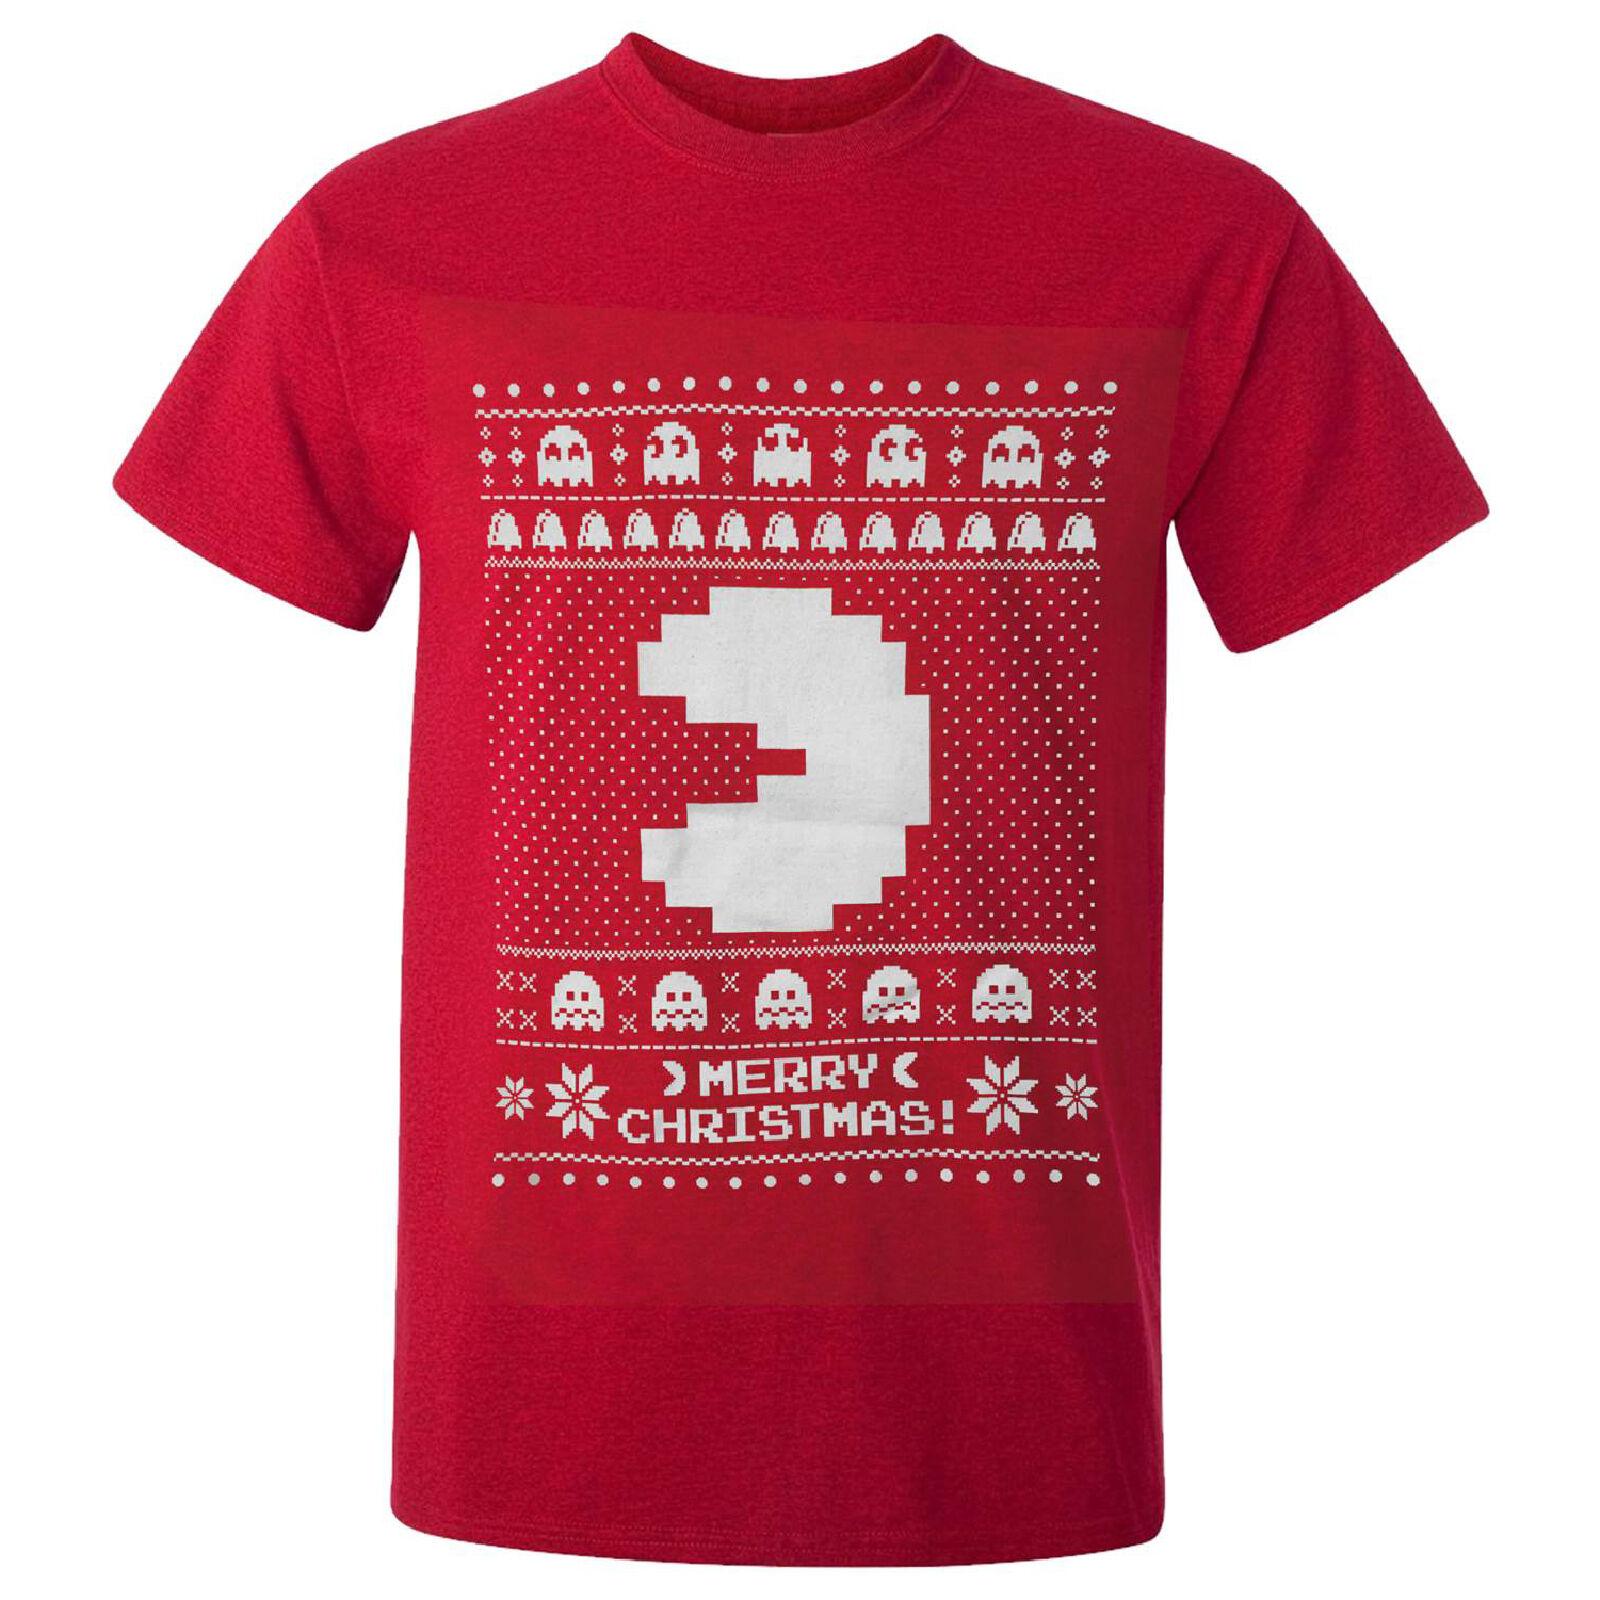 Geek Clothing Namco Men's Merry Pac-Man Christmas T-Shirt - Red - S - Red